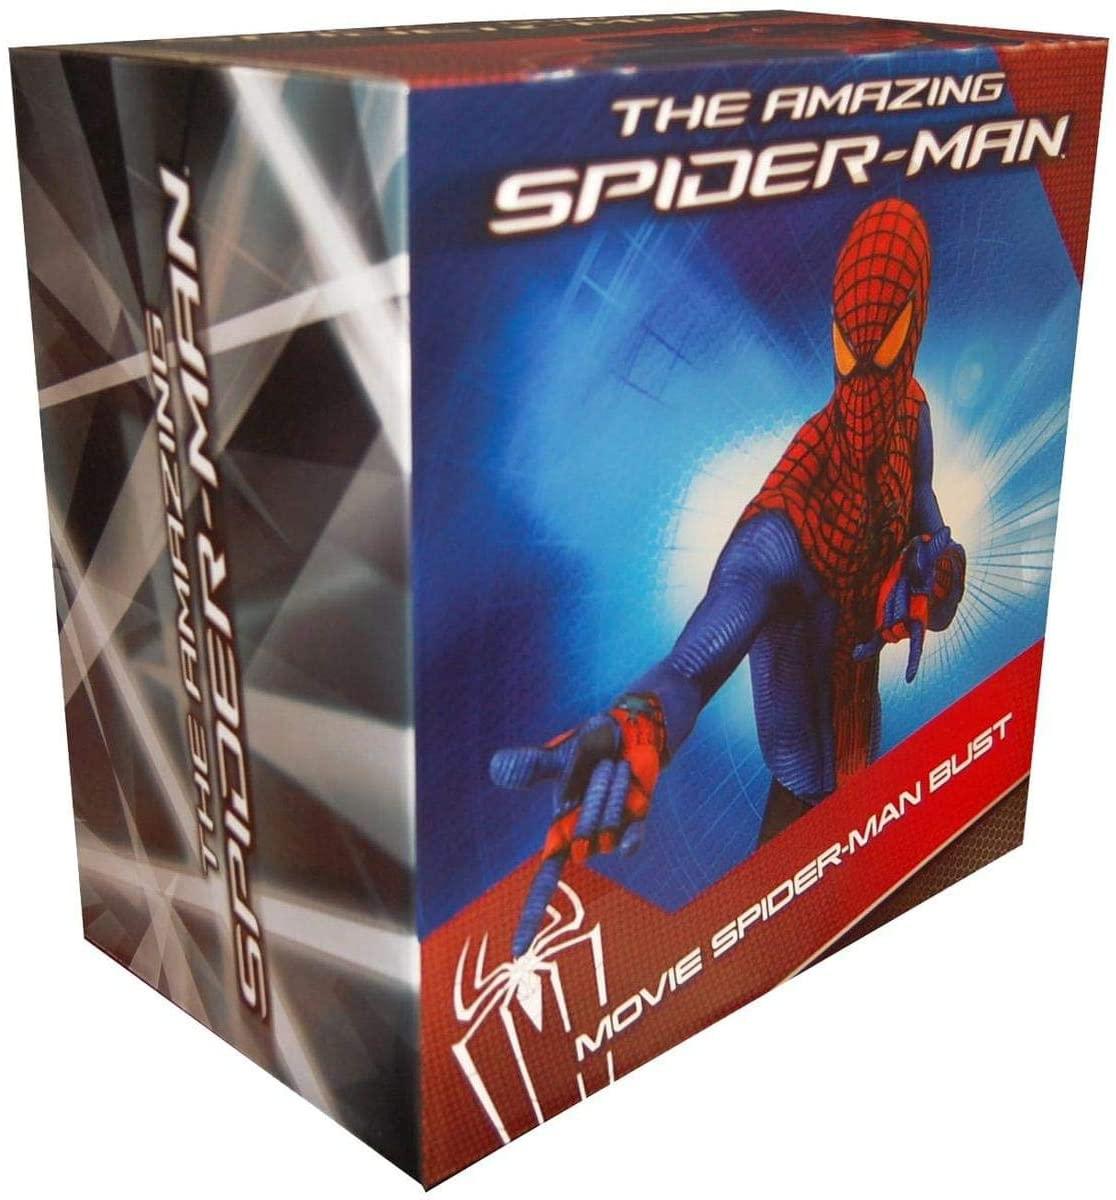 Amazing SpiderMan Movie 2012 SDCC San Diego Comic Con Exclusive Figure SpiderMan Metallic Bust